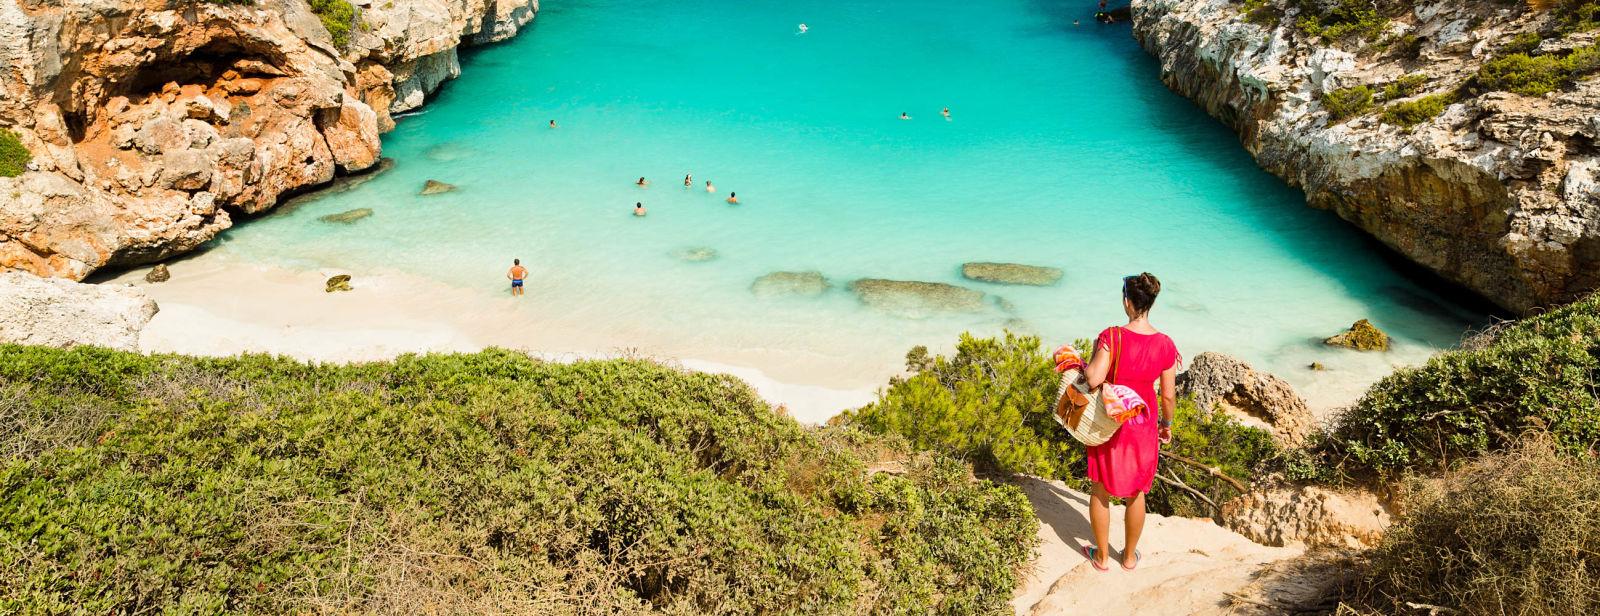 Calo des Moro, Mallorca Spanien Bucht Strand